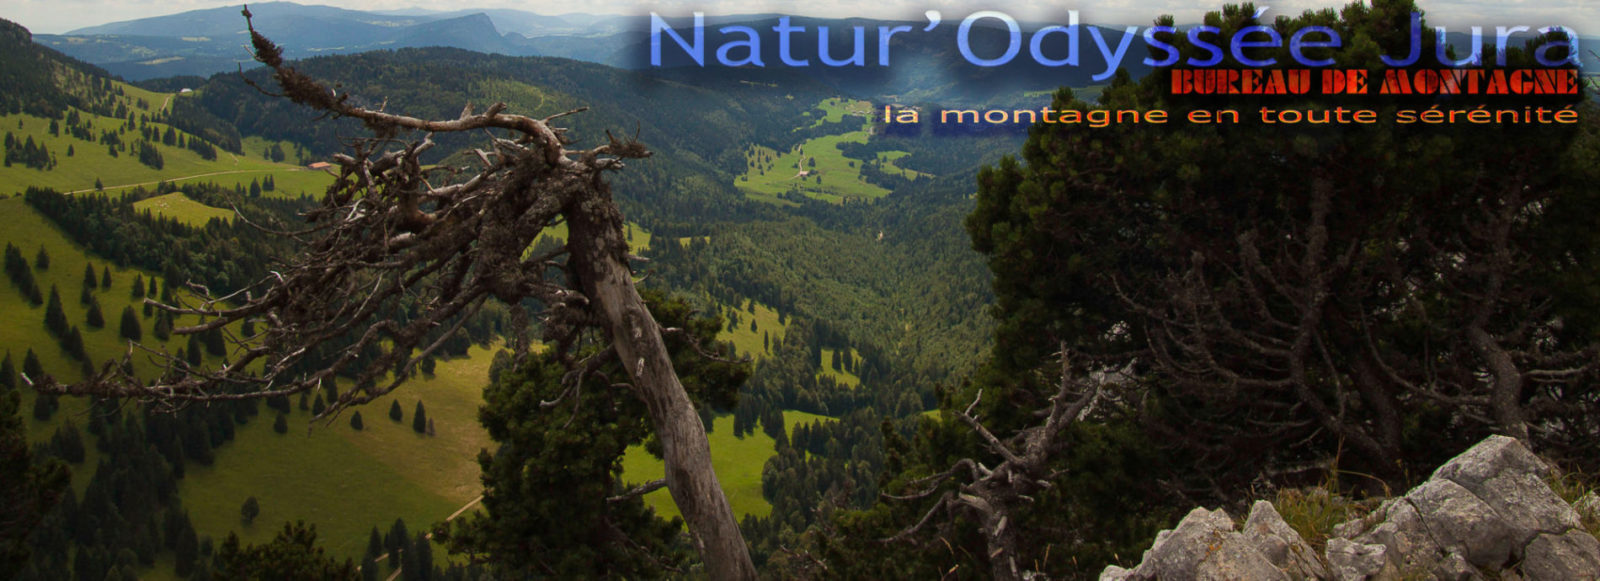 Natur'Odyssée Jura Paysage